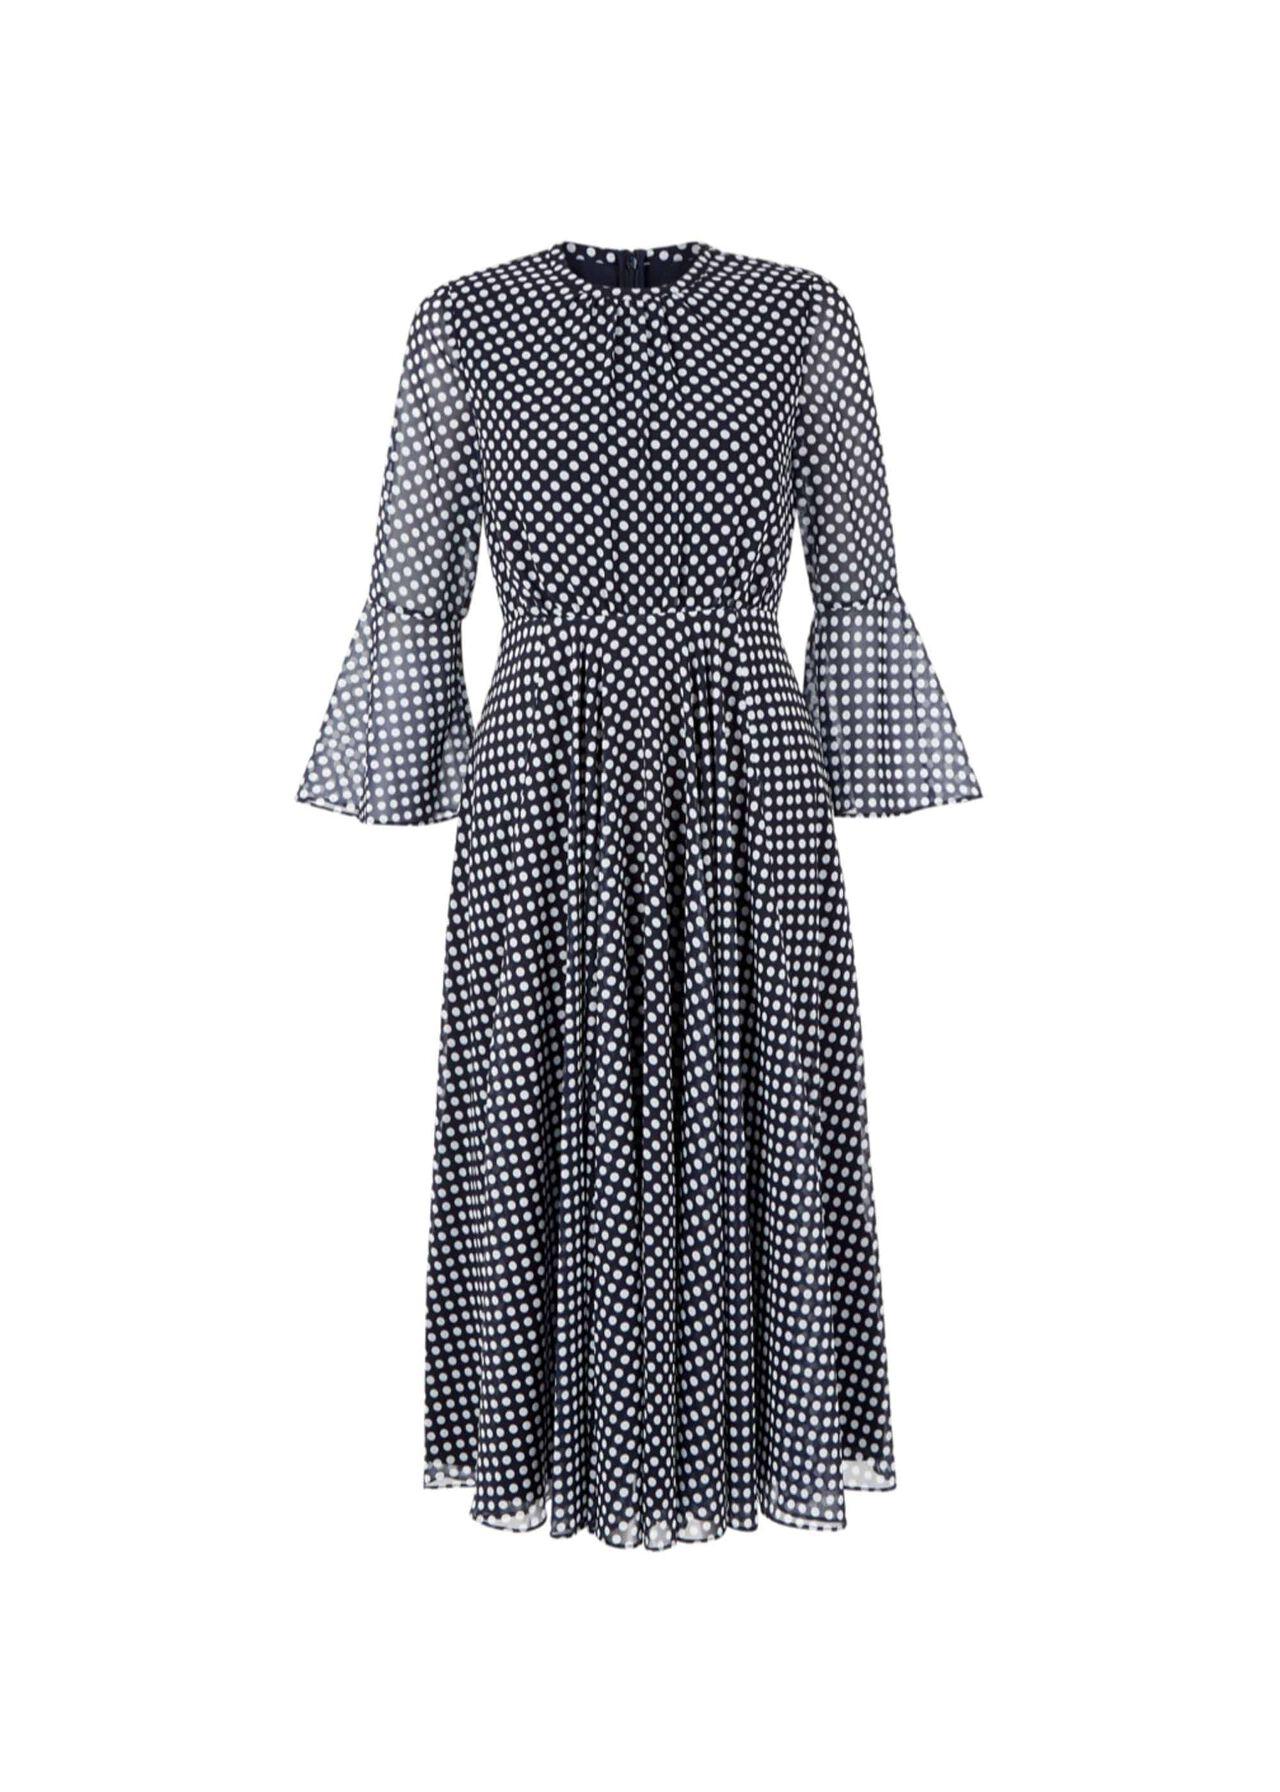 Lilia Dress Navy Ivory